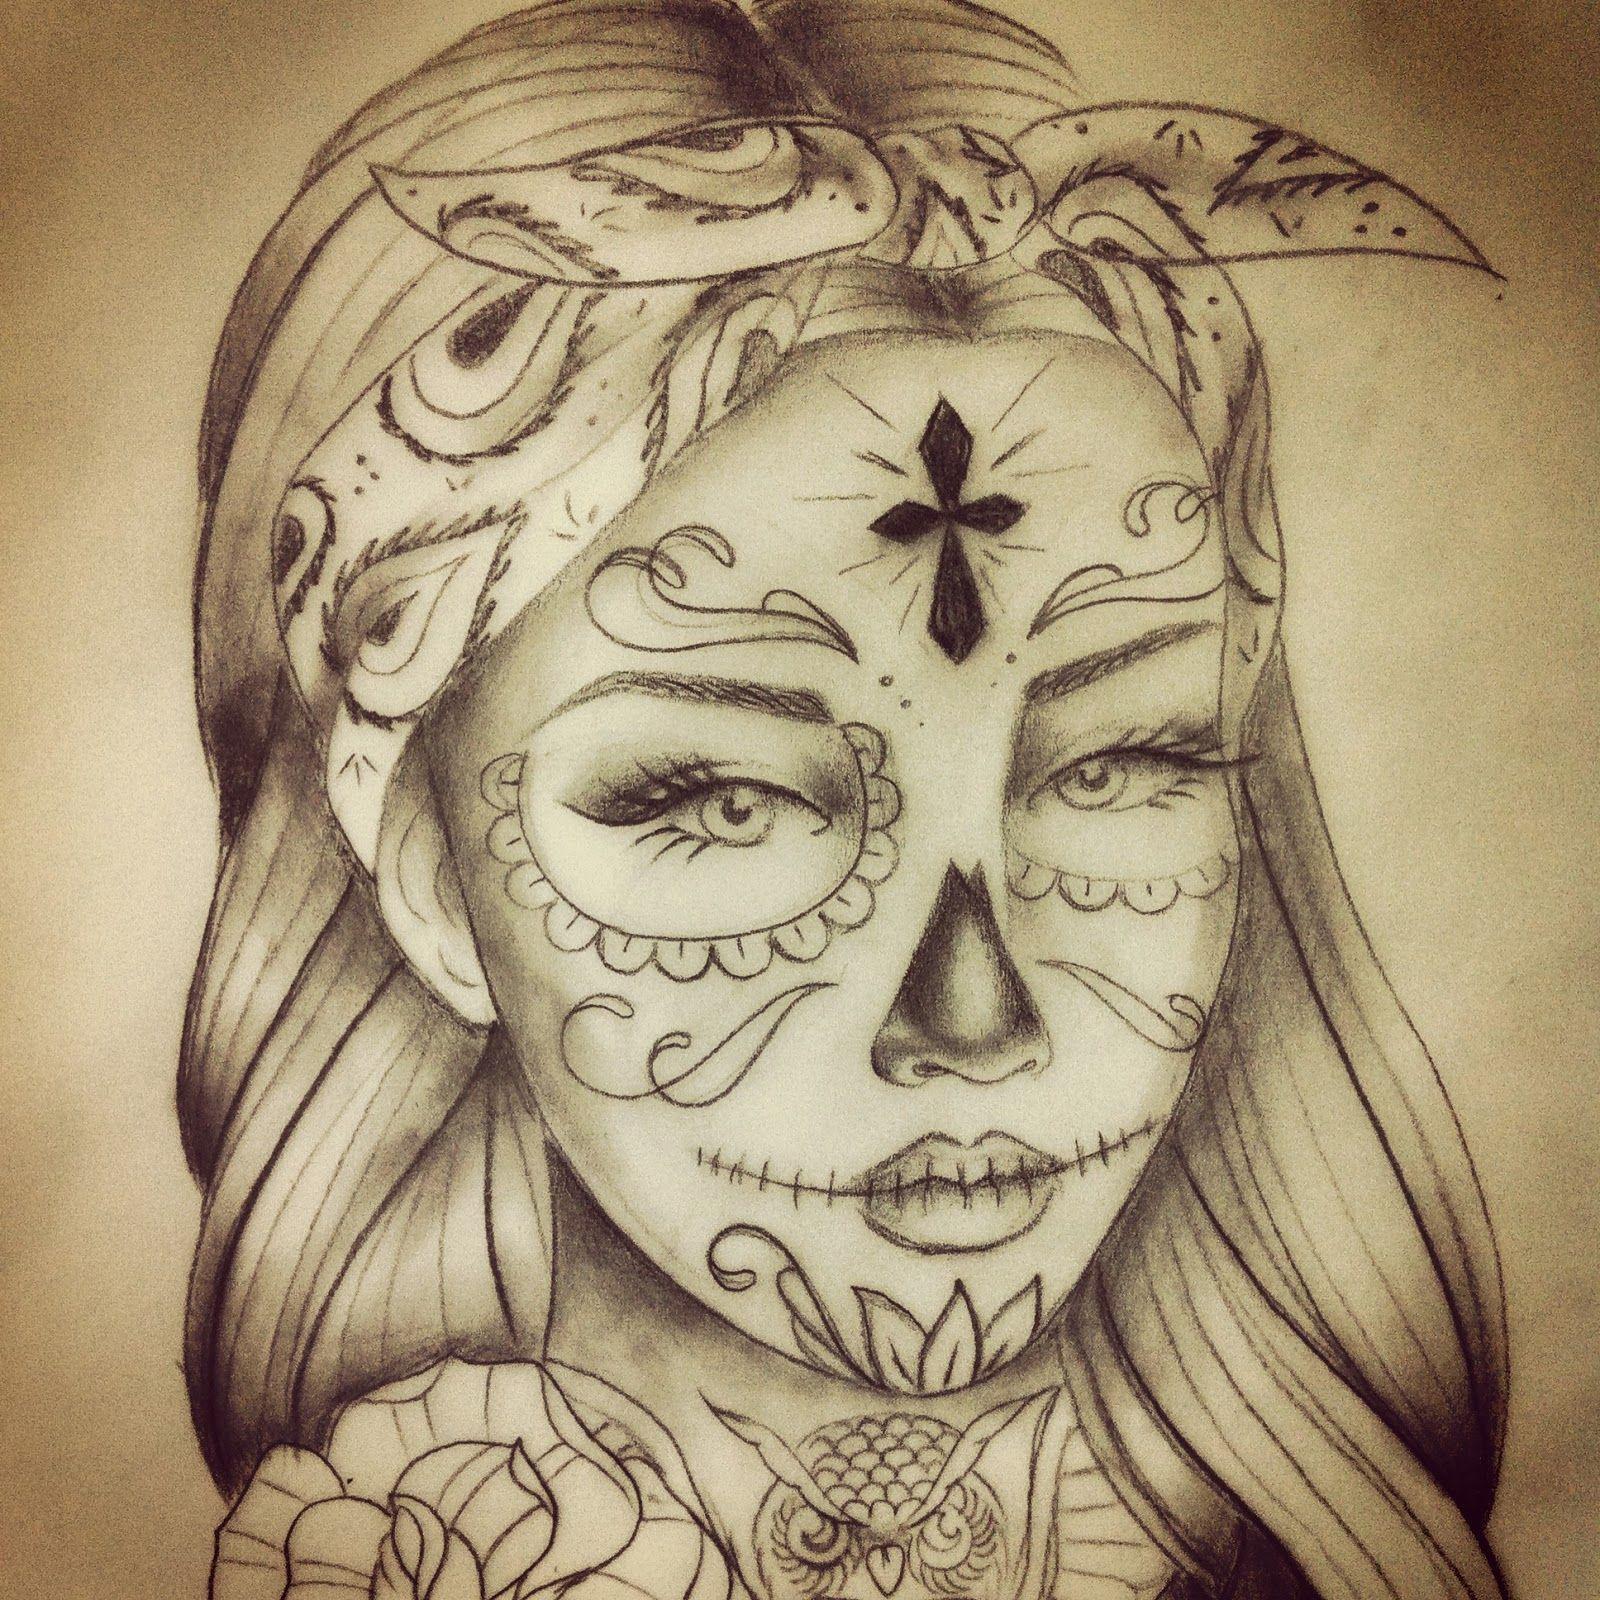 Schön Tattoo Idee Frau Beste Wahl Besaly Tattoo: Santa Muerte Catrina Tatuaggio /